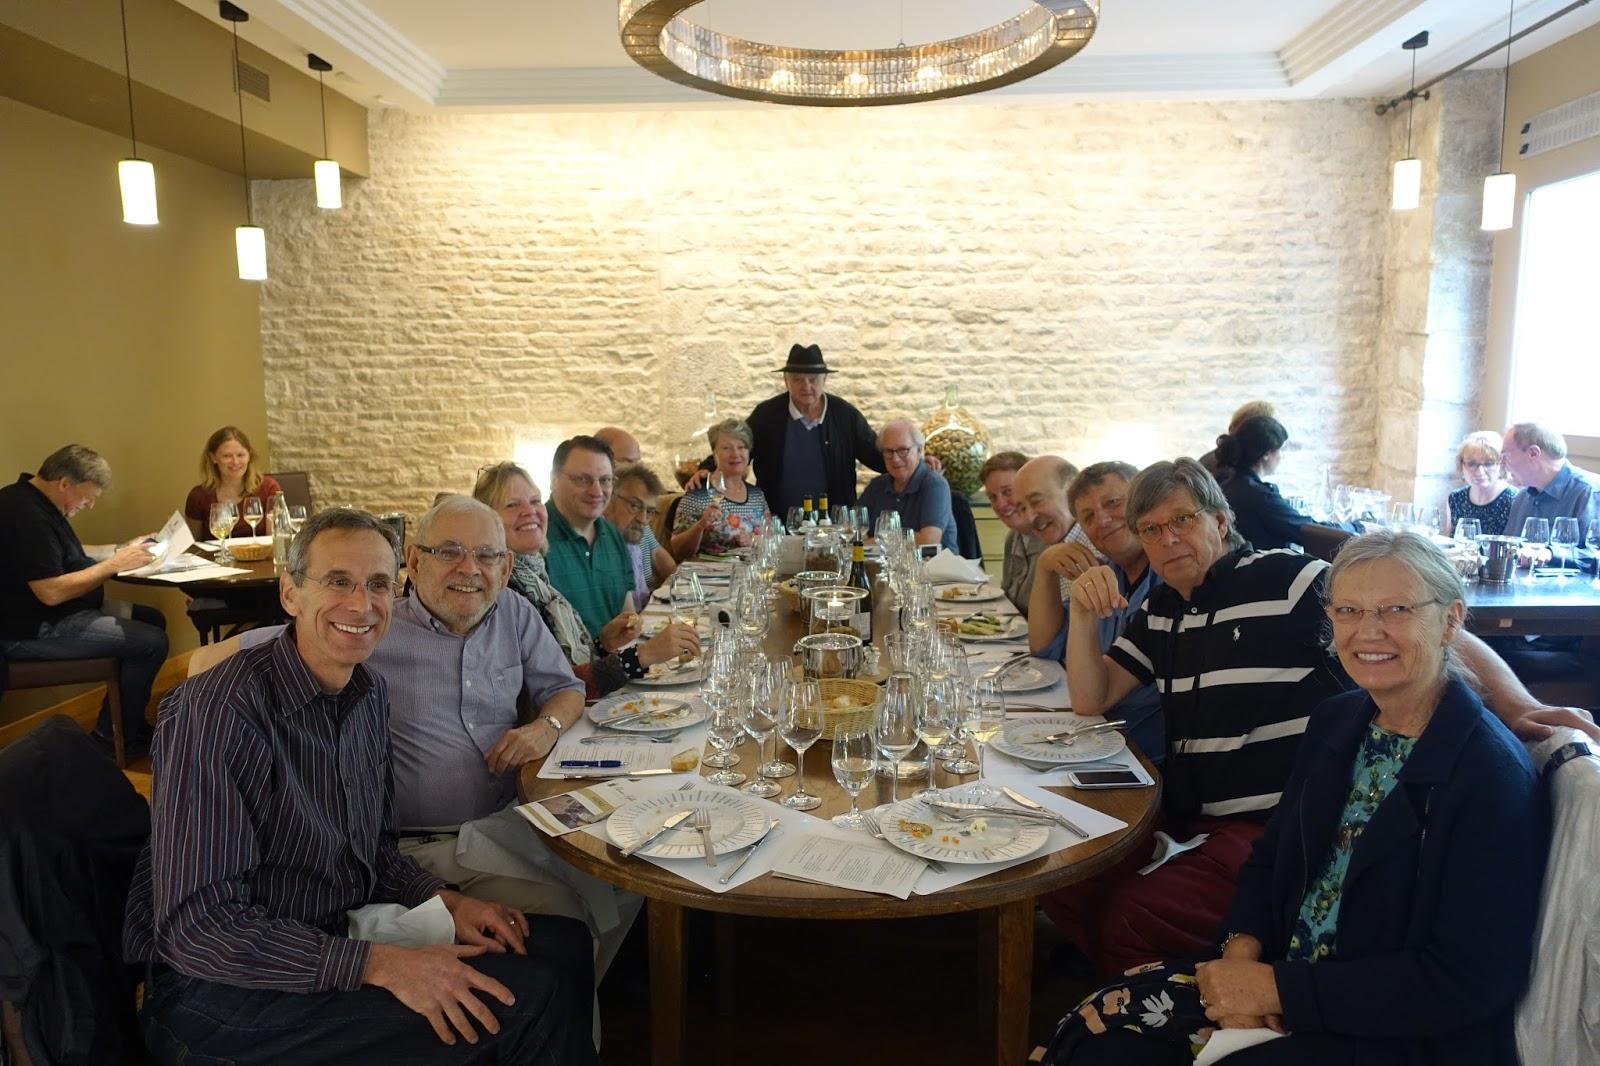 Schiller wine olivier leflaive in puligny montrachet - La table d olivier leflaive puligny montrachet ...